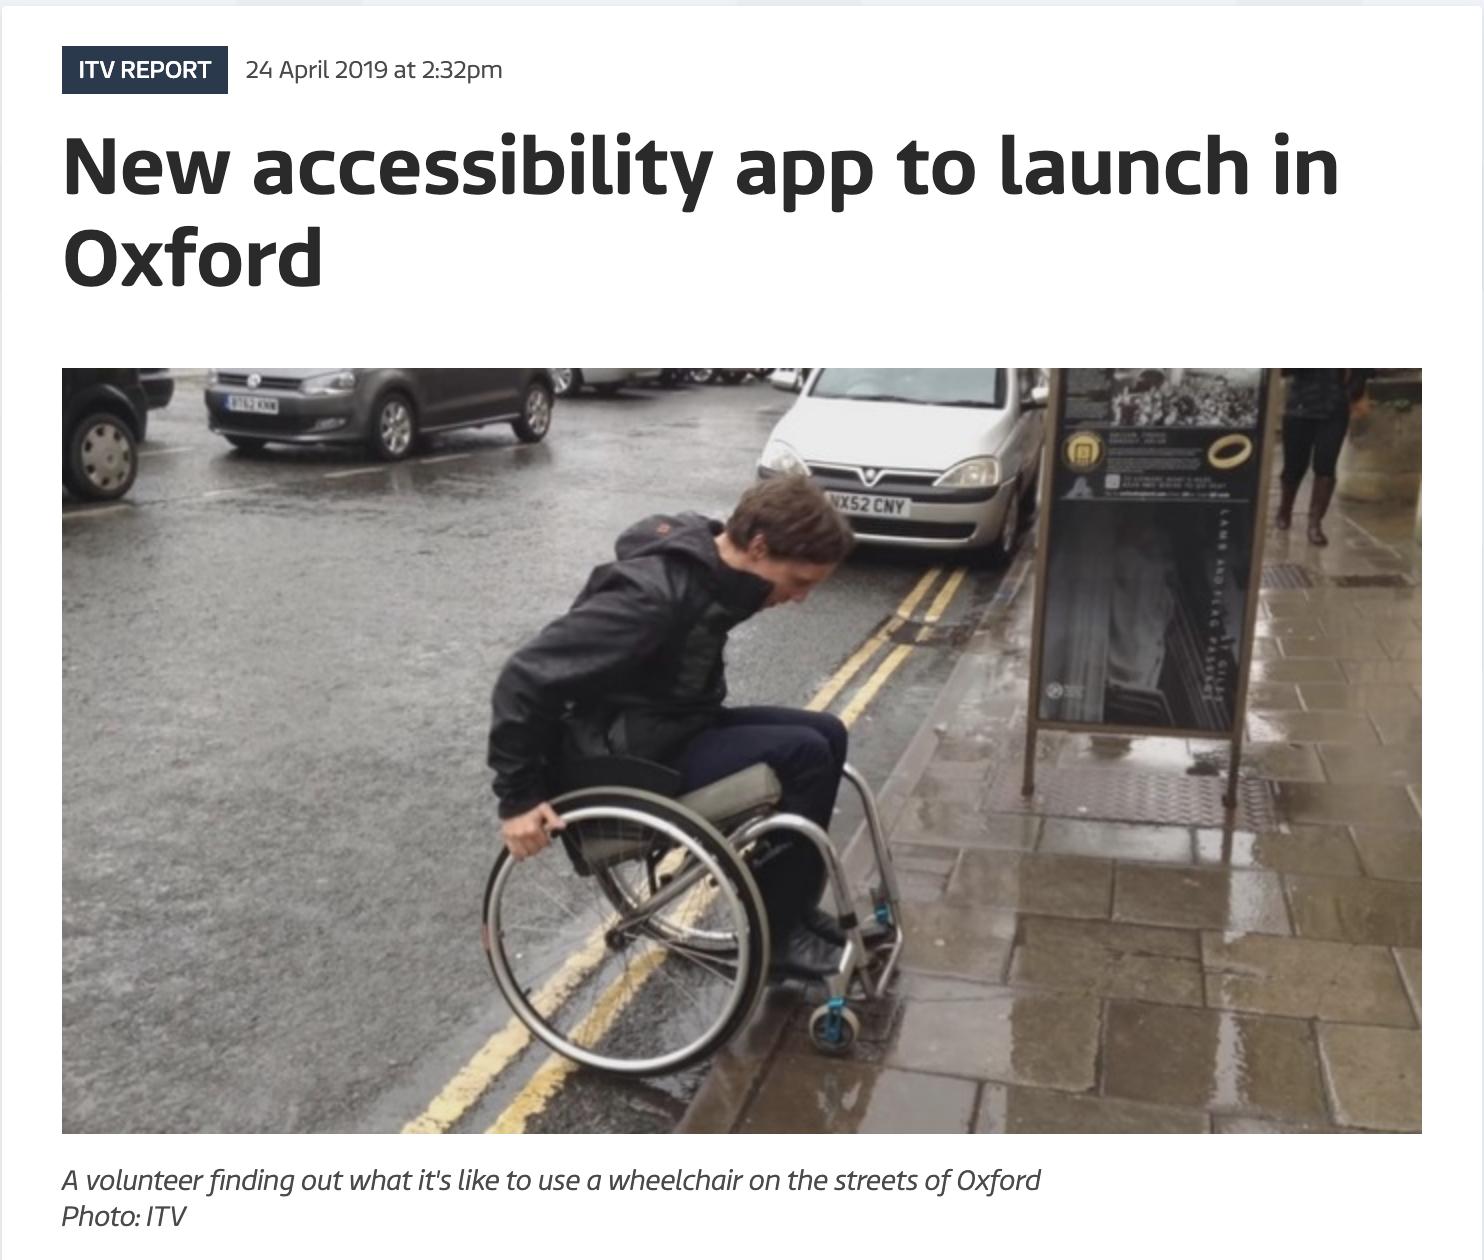 Thumbnail of iTV news article, 24 April 2019.